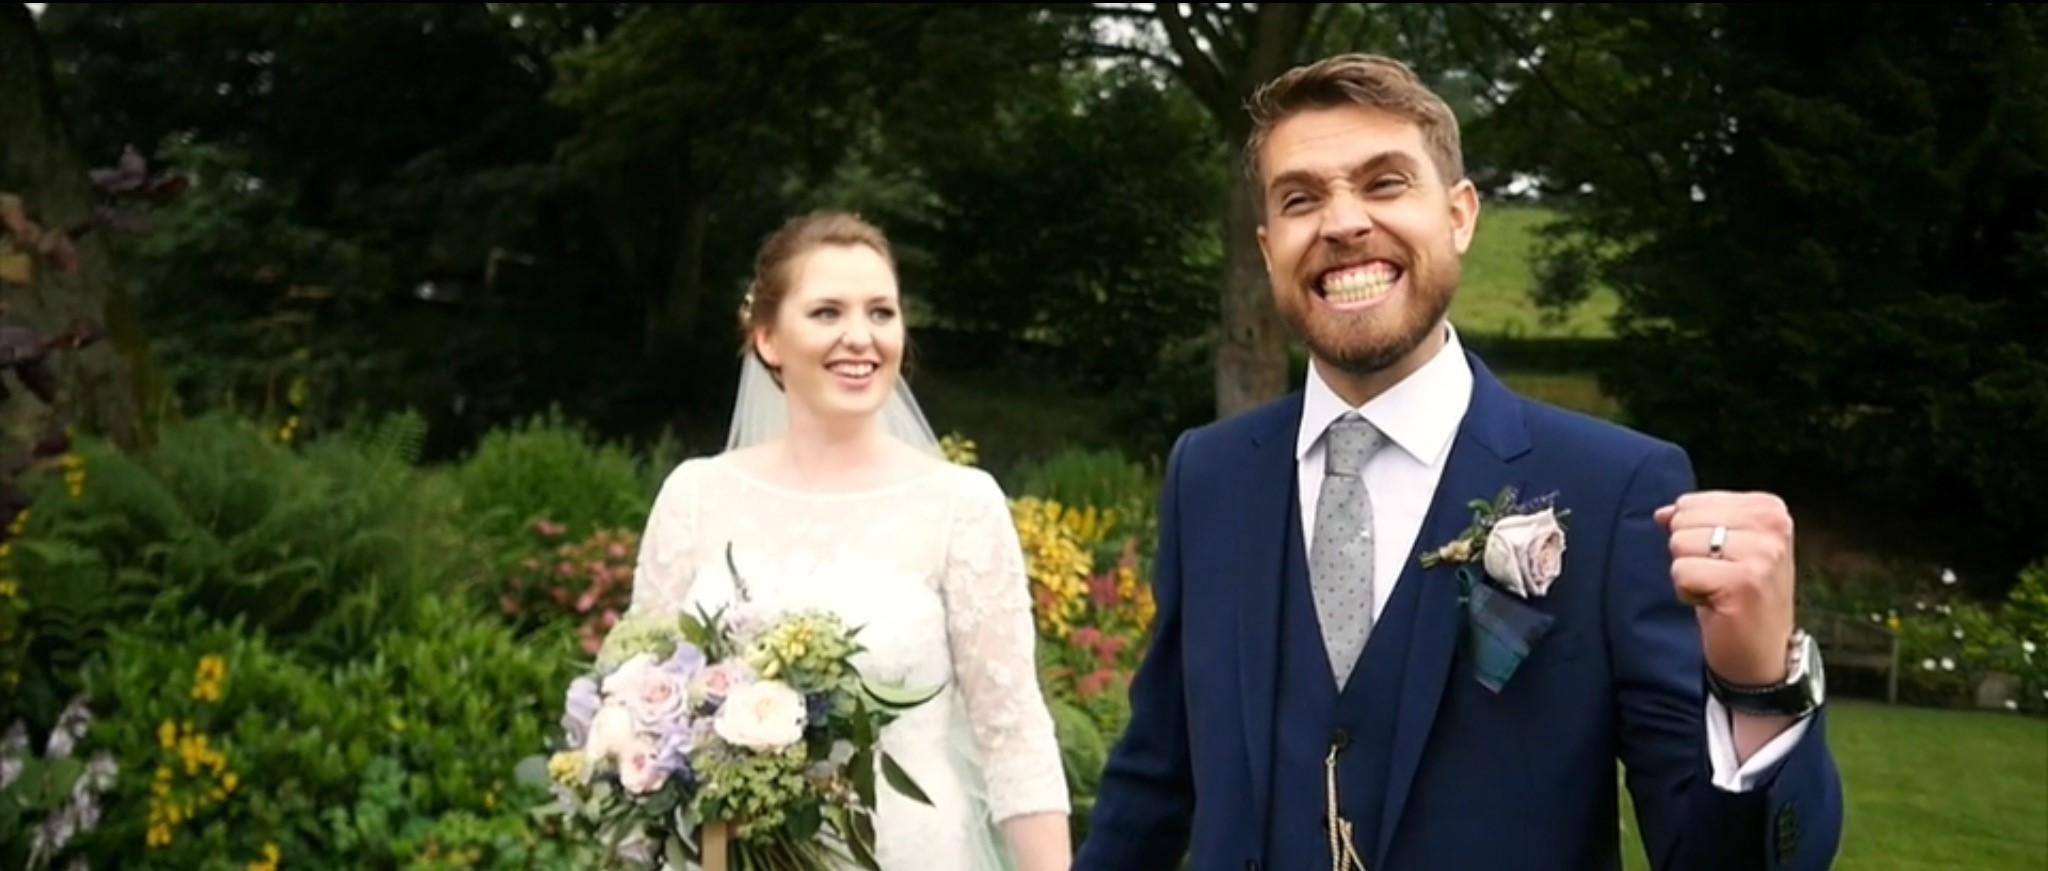 happy groom with bride in background - Adam Wing Cinematographer